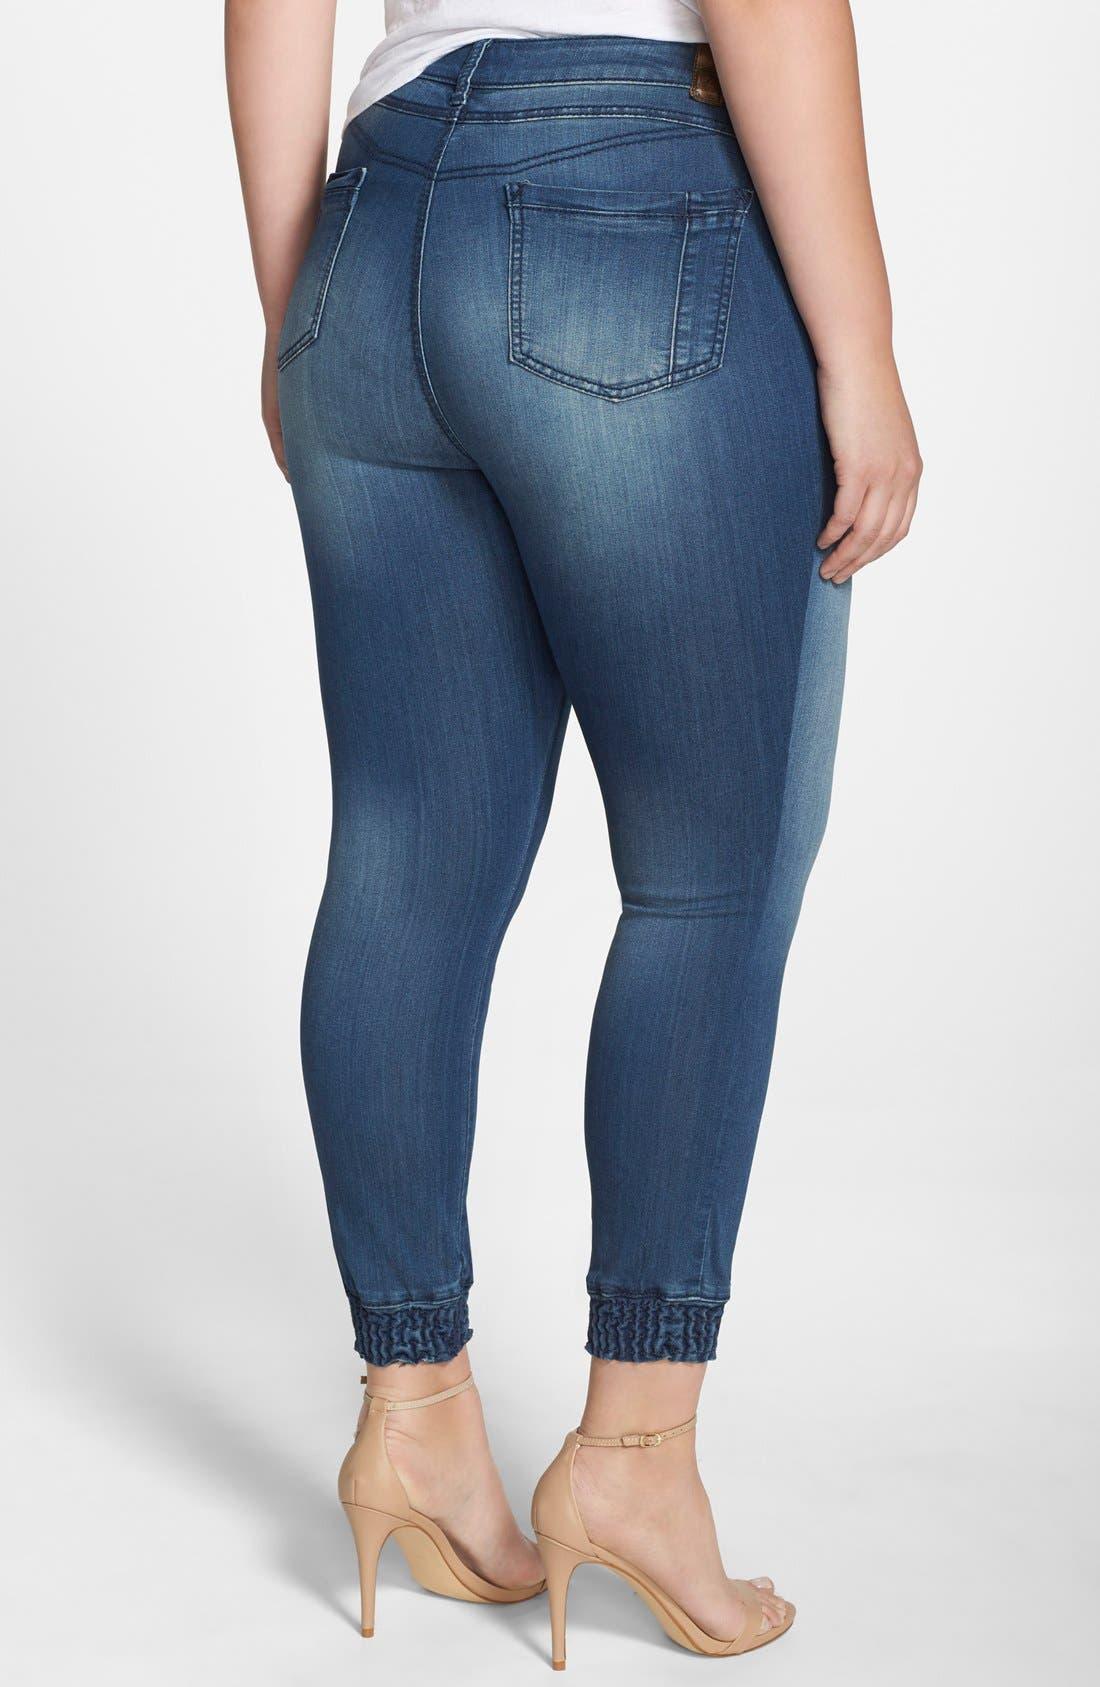 'Suzzie' Stretch Knit Denim Crop Jeans,                             Alternate thumbnail 2, color,                             DARK BLUE